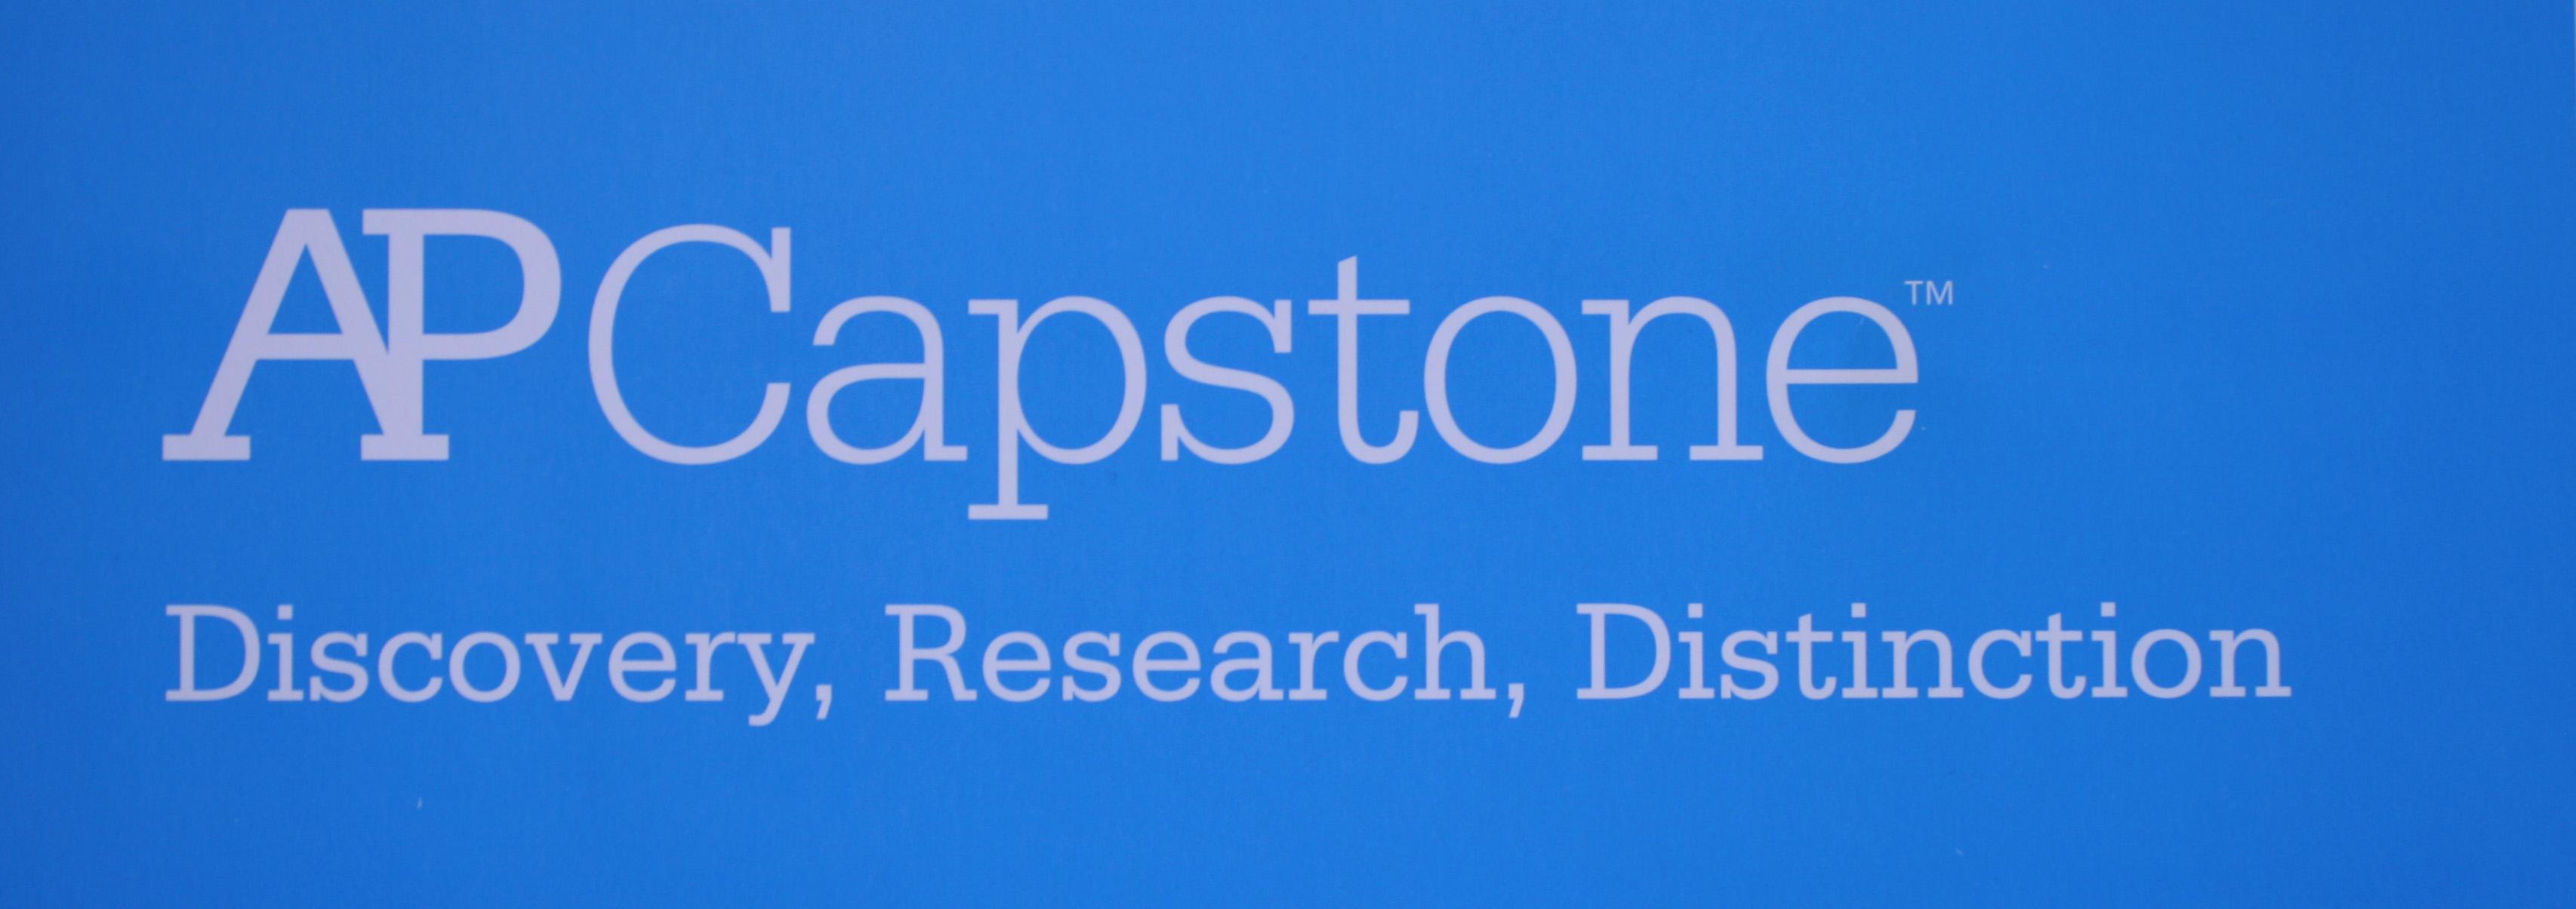 AP_Capstone_4-9-15